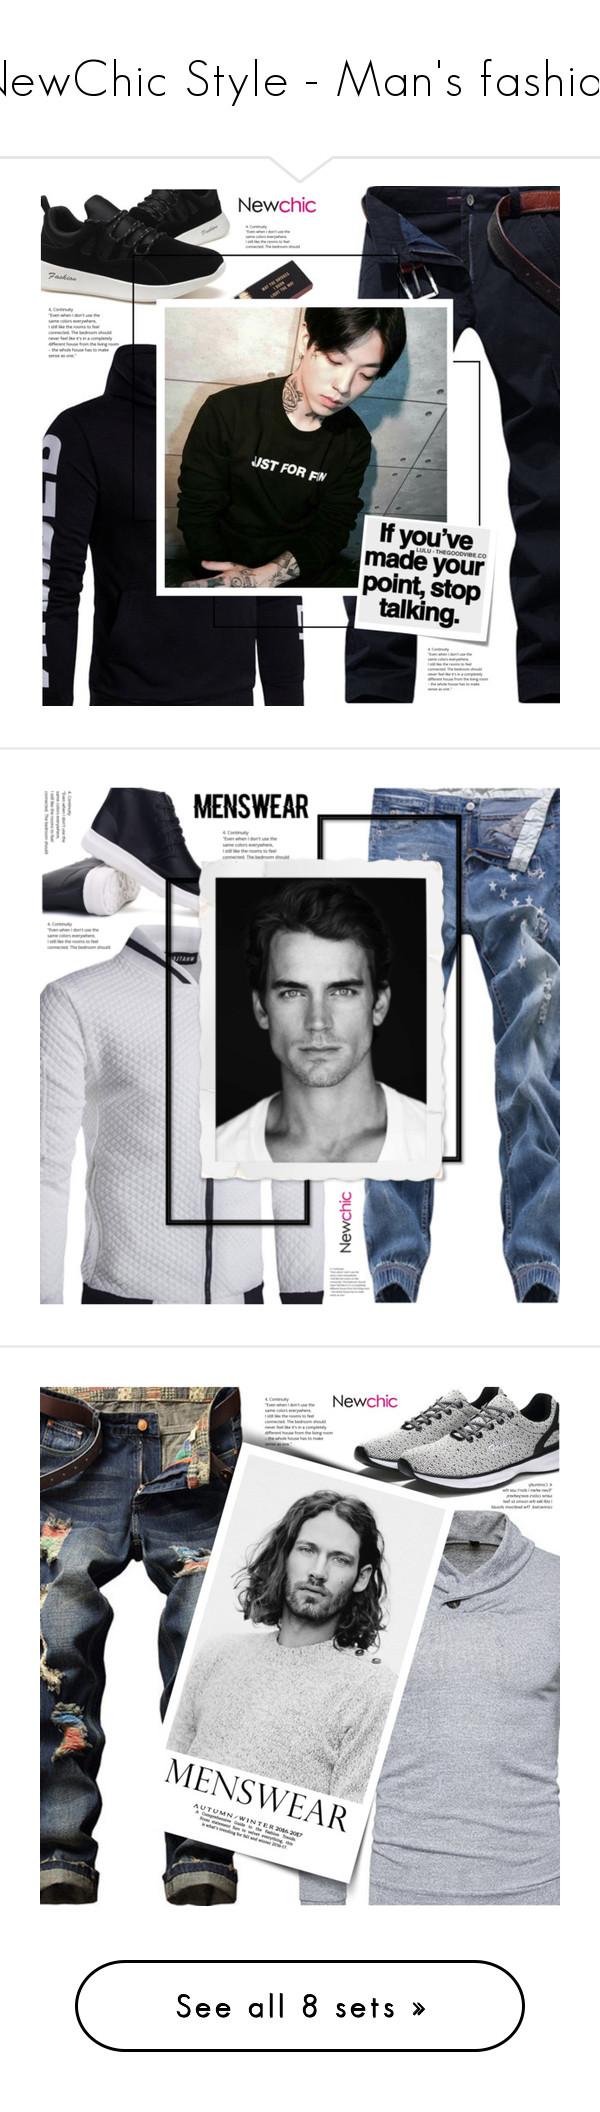 """NewChic Style - Man's fashion"" by mymilla on Polyvore featuring Post-It, men's fashion, menswear, Chanel, Kiehl's, DUO, newchic e lovenewchic"